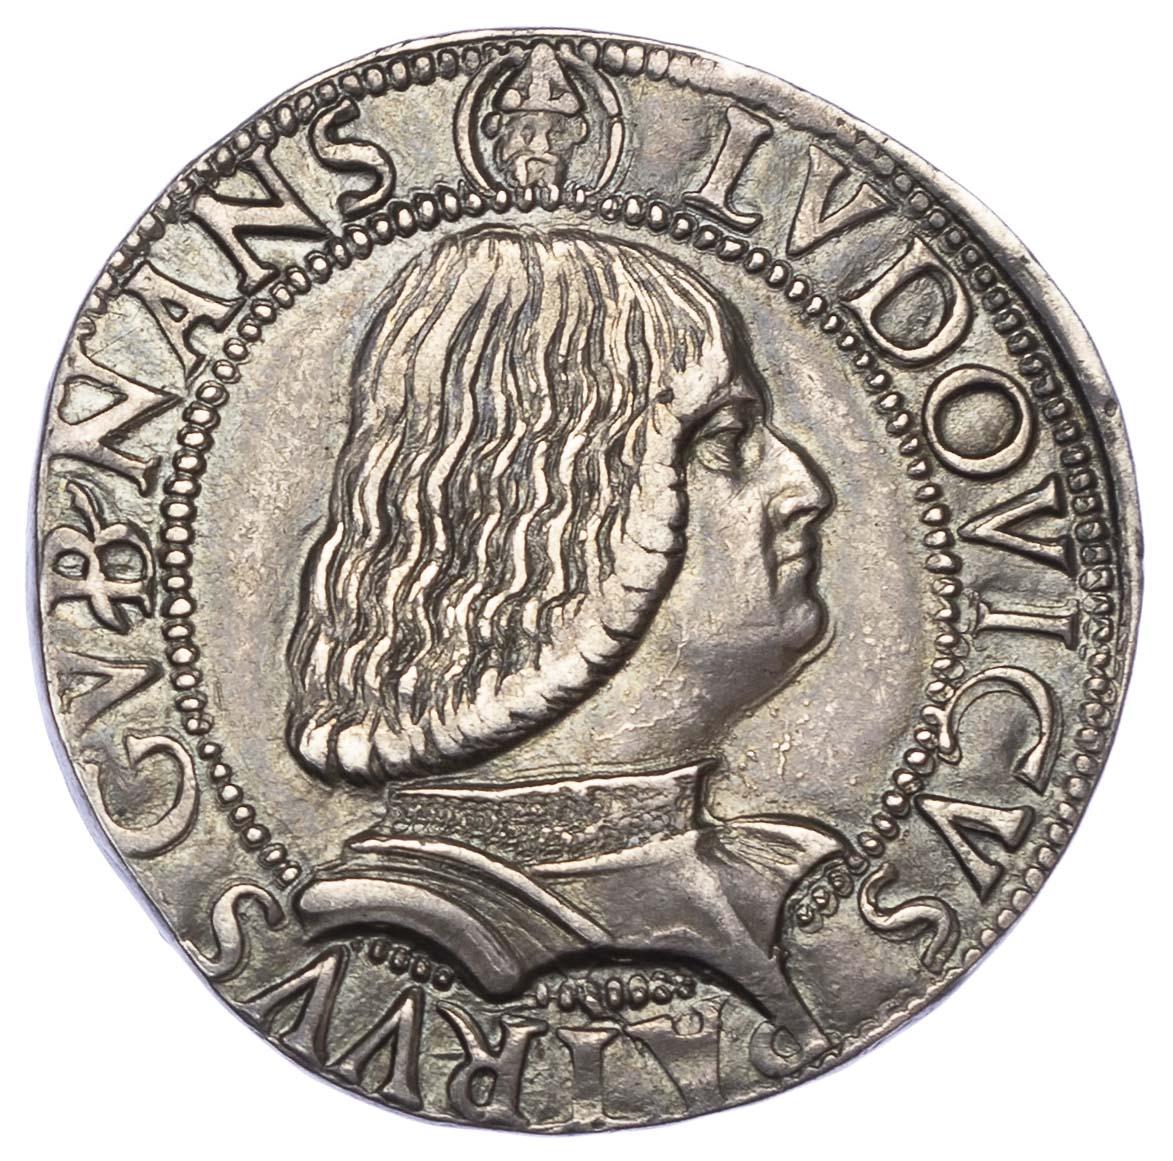 Italy, Milan, Gian Galeazzo Maria Sforza & Ludovico Maria Sforza (1476-94), silver Testone